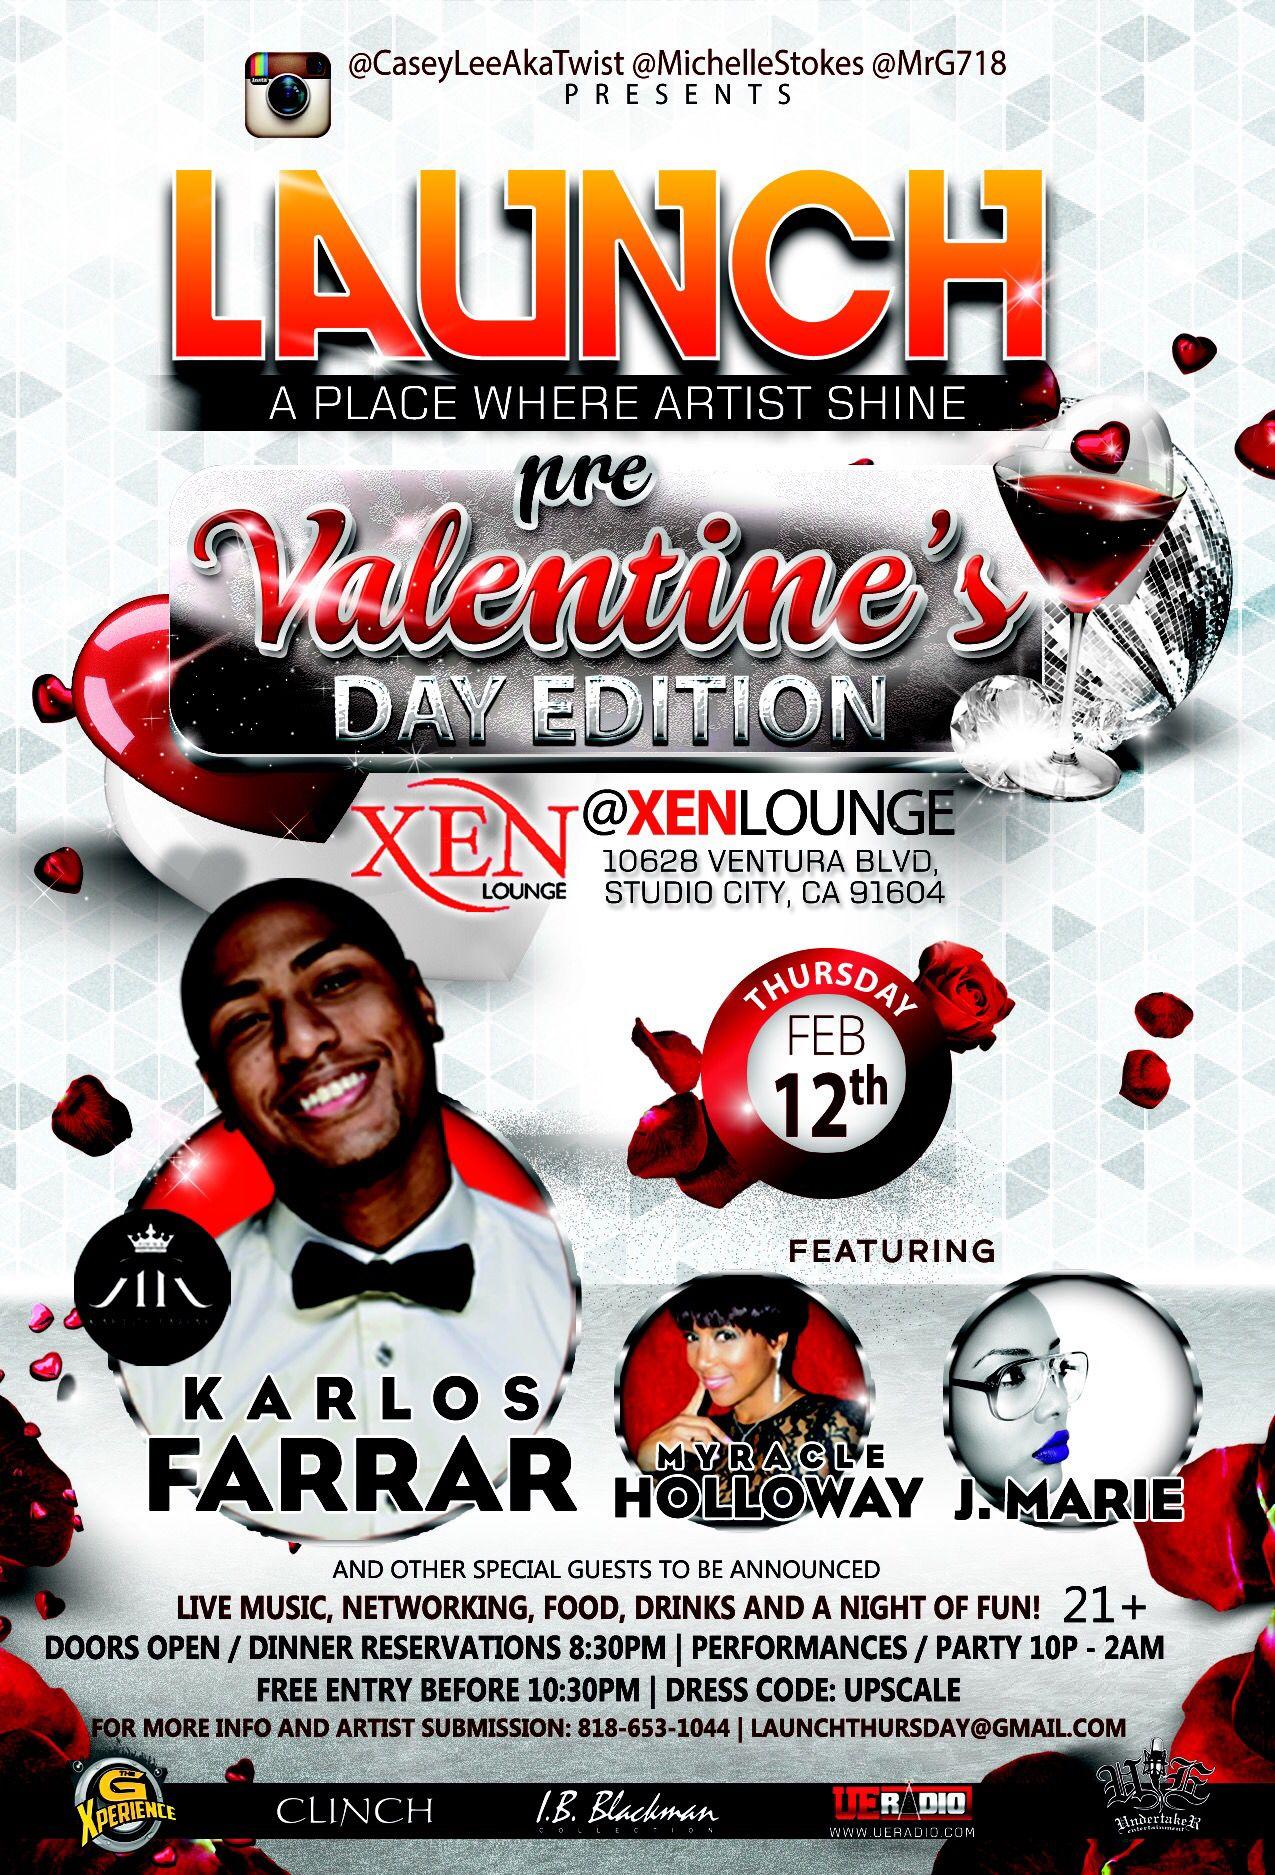 Pre Valentines Affair In Los Angeles At Xen Lounge In Studio City Studio City Studio Live Music